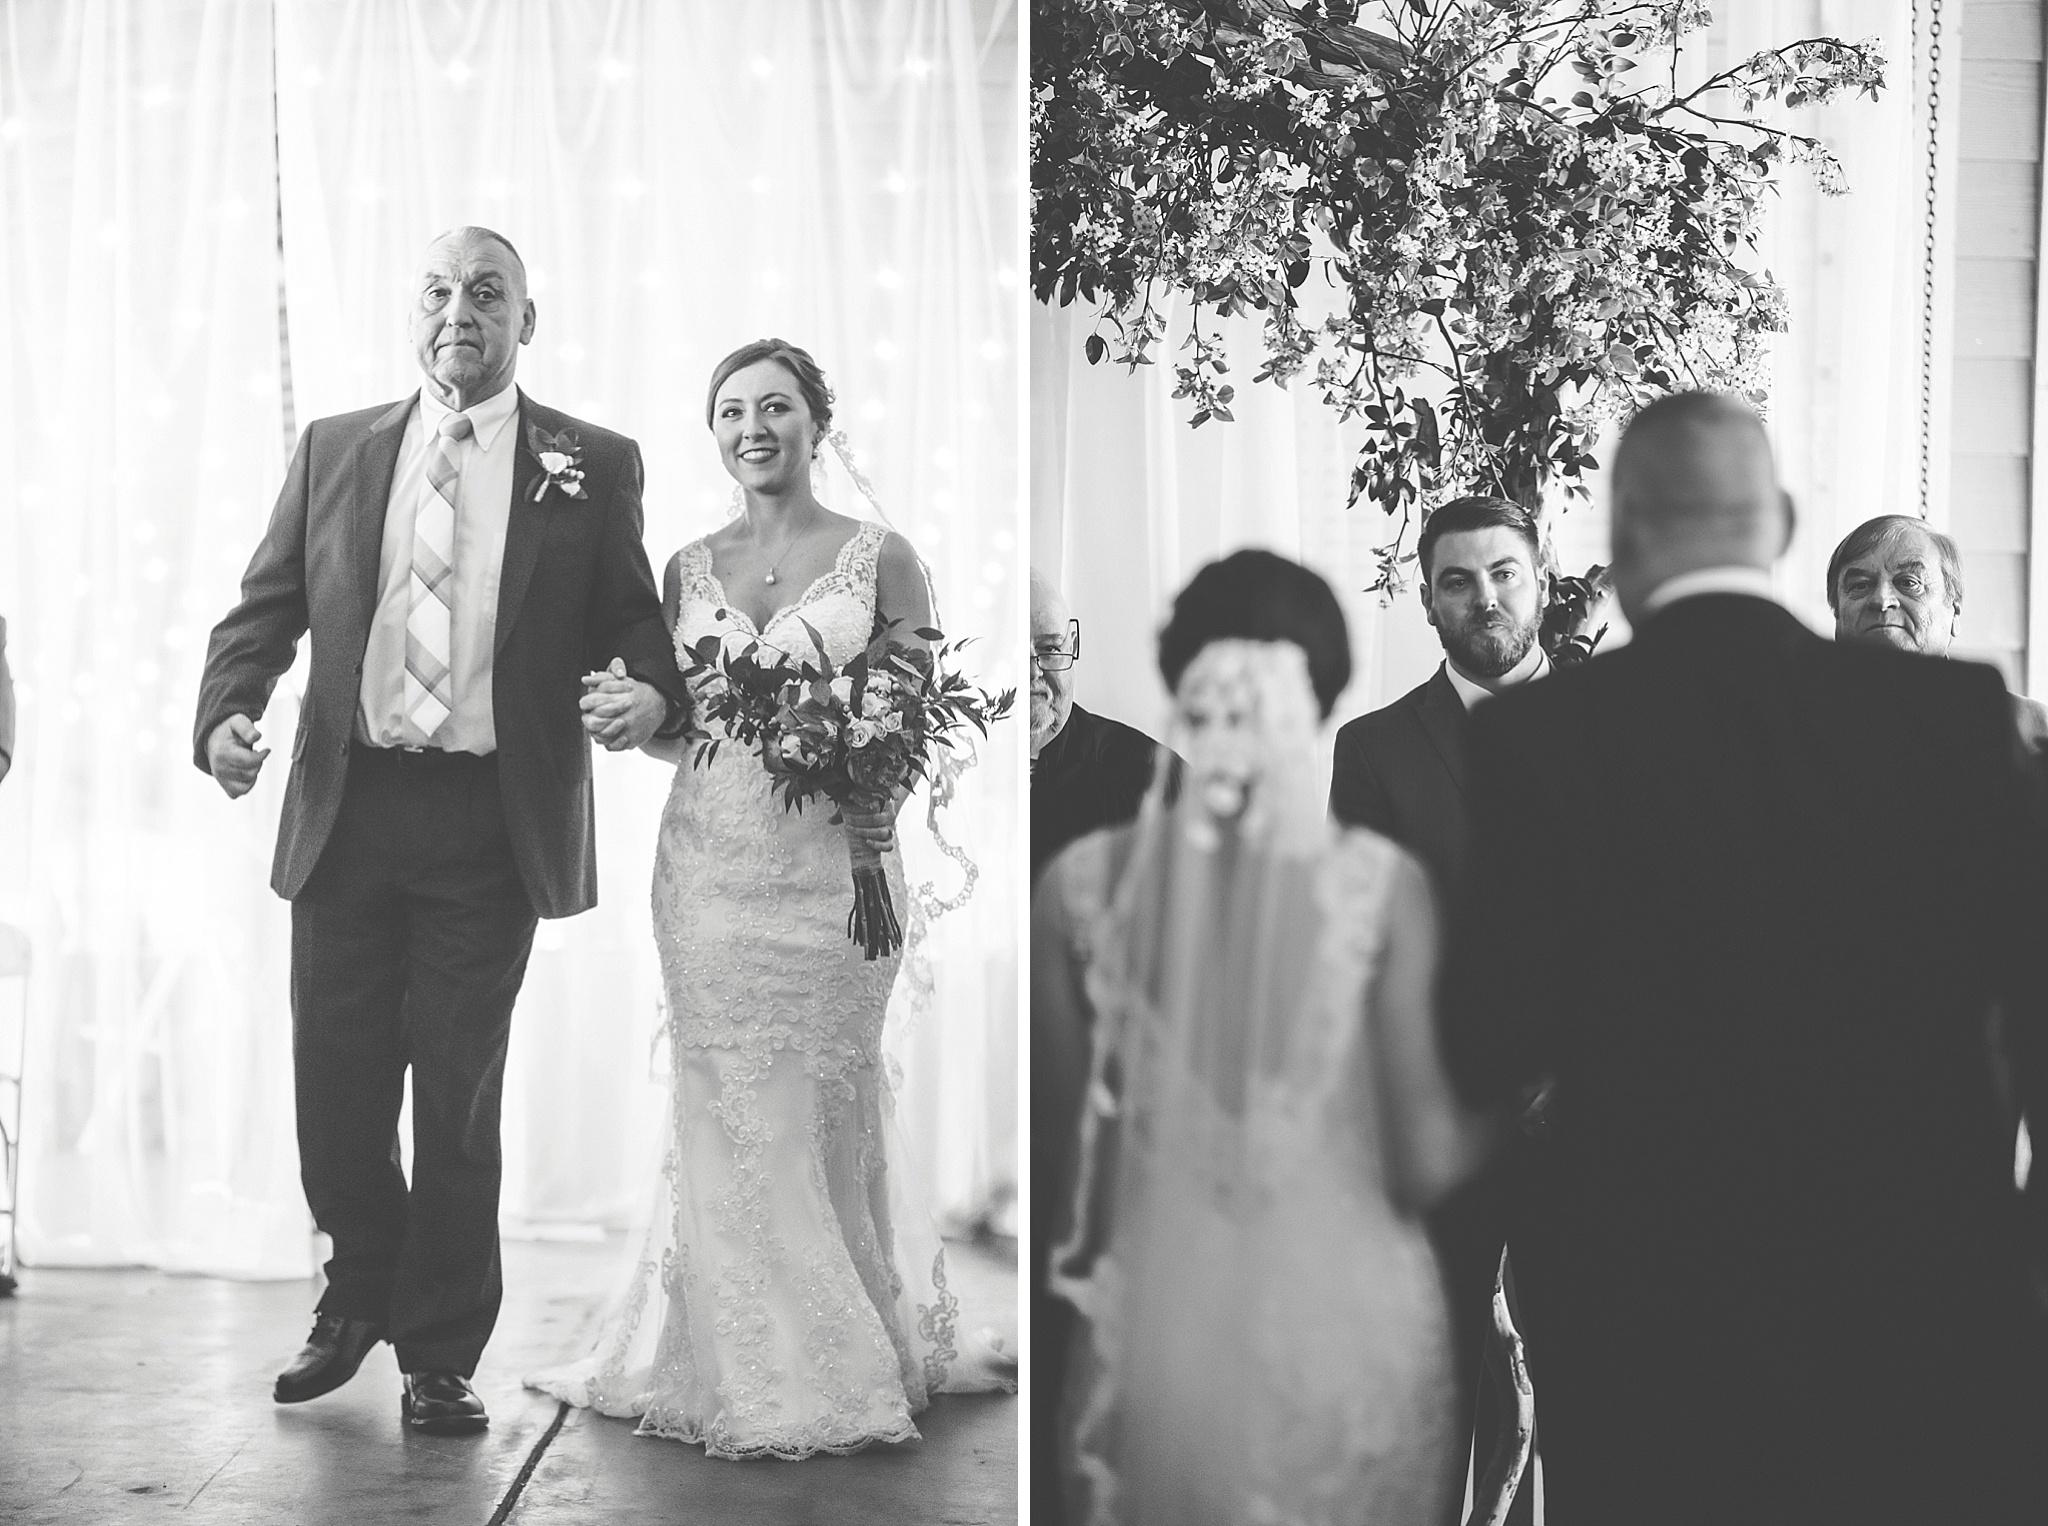 Manteo-NC-Wedding-Photographer-141.jpg